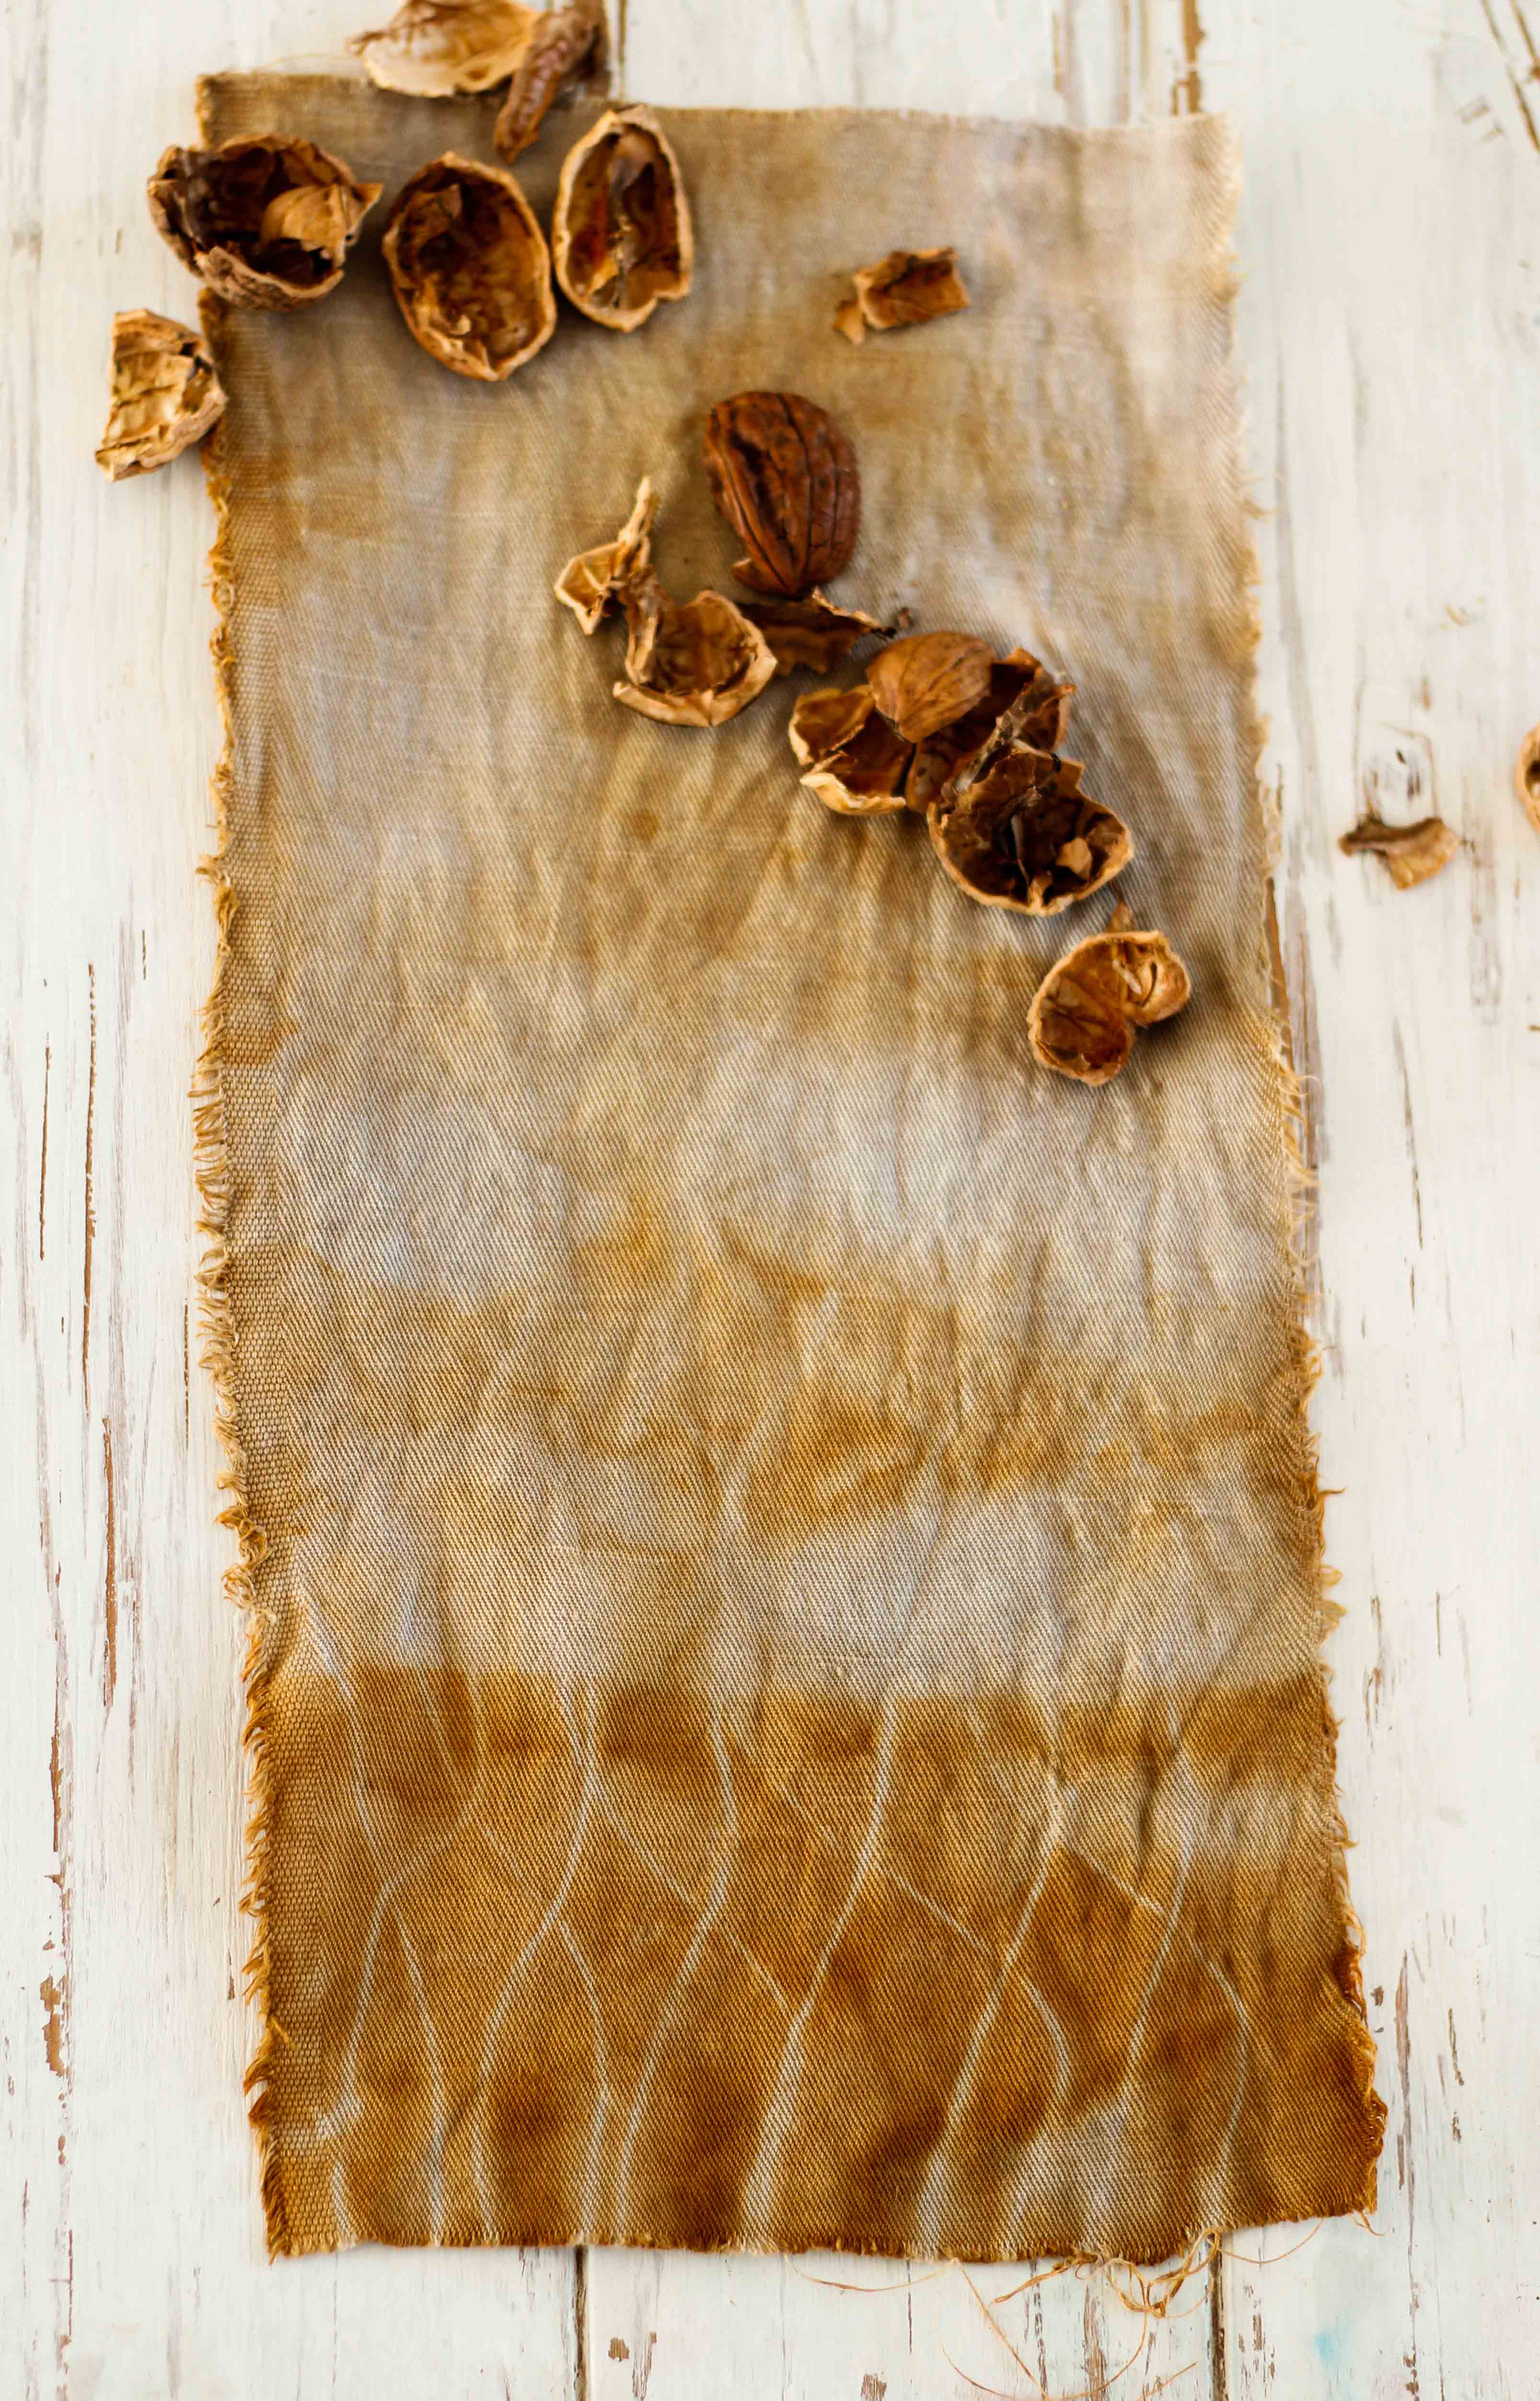 claudialeclercq-naturaldyes-tintesnaturales-walnutdyeing-tinte de nueces-teinture de noix-4